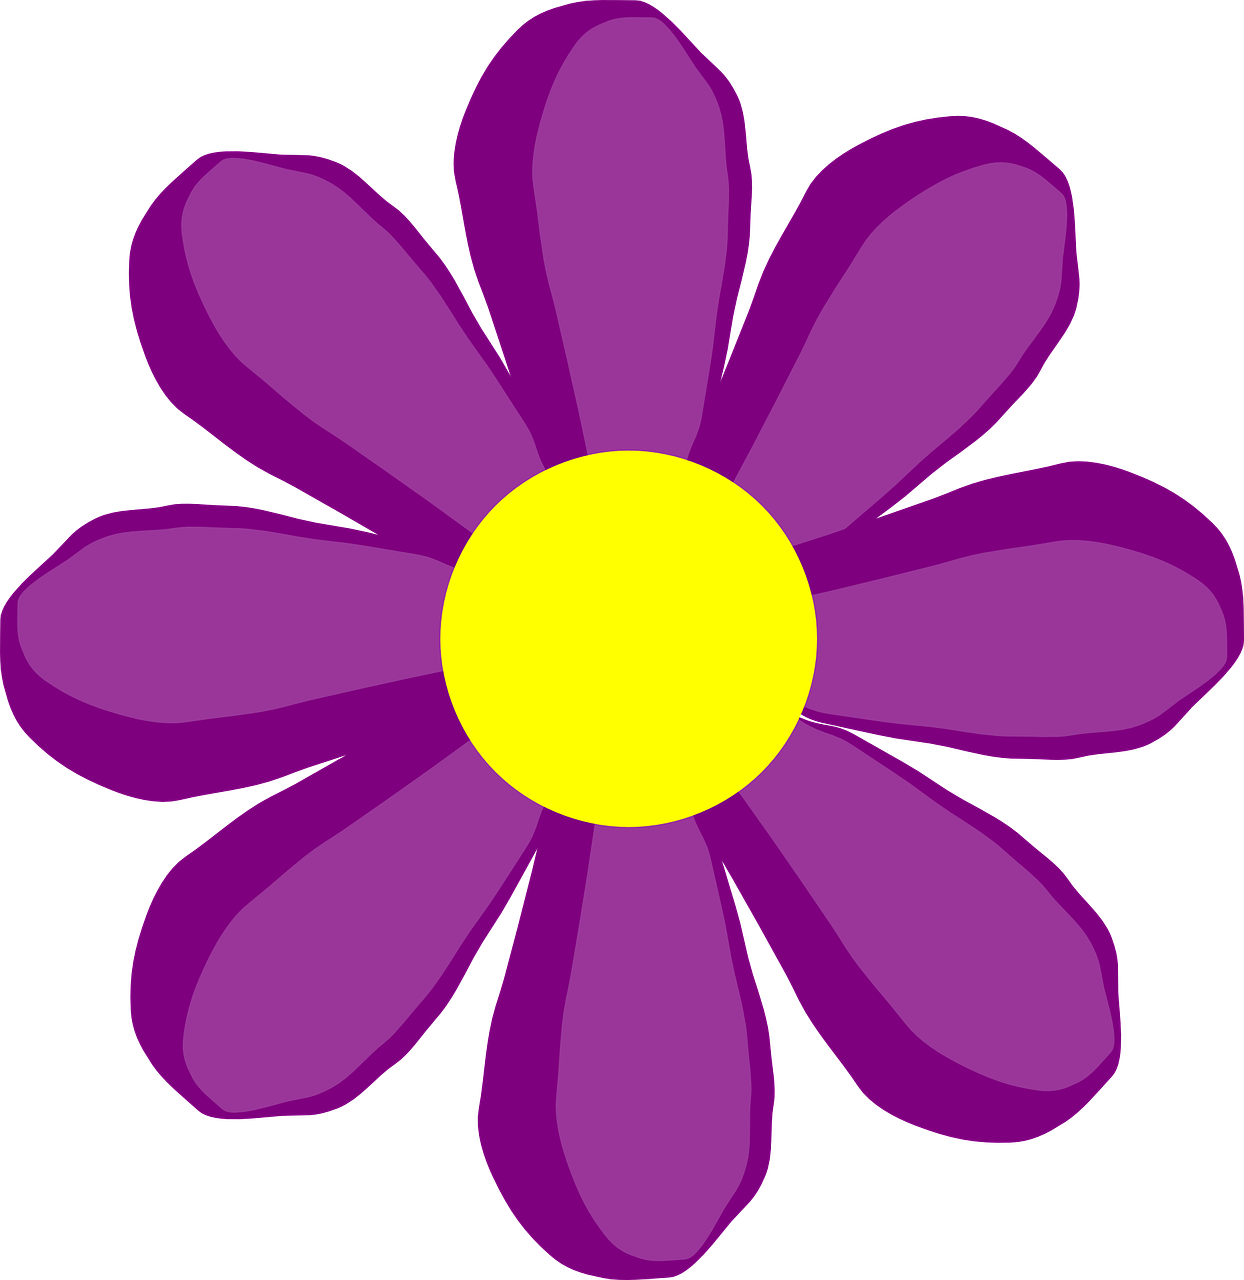 Flower Purple Daisy Free Vector Graphic On Pixabay